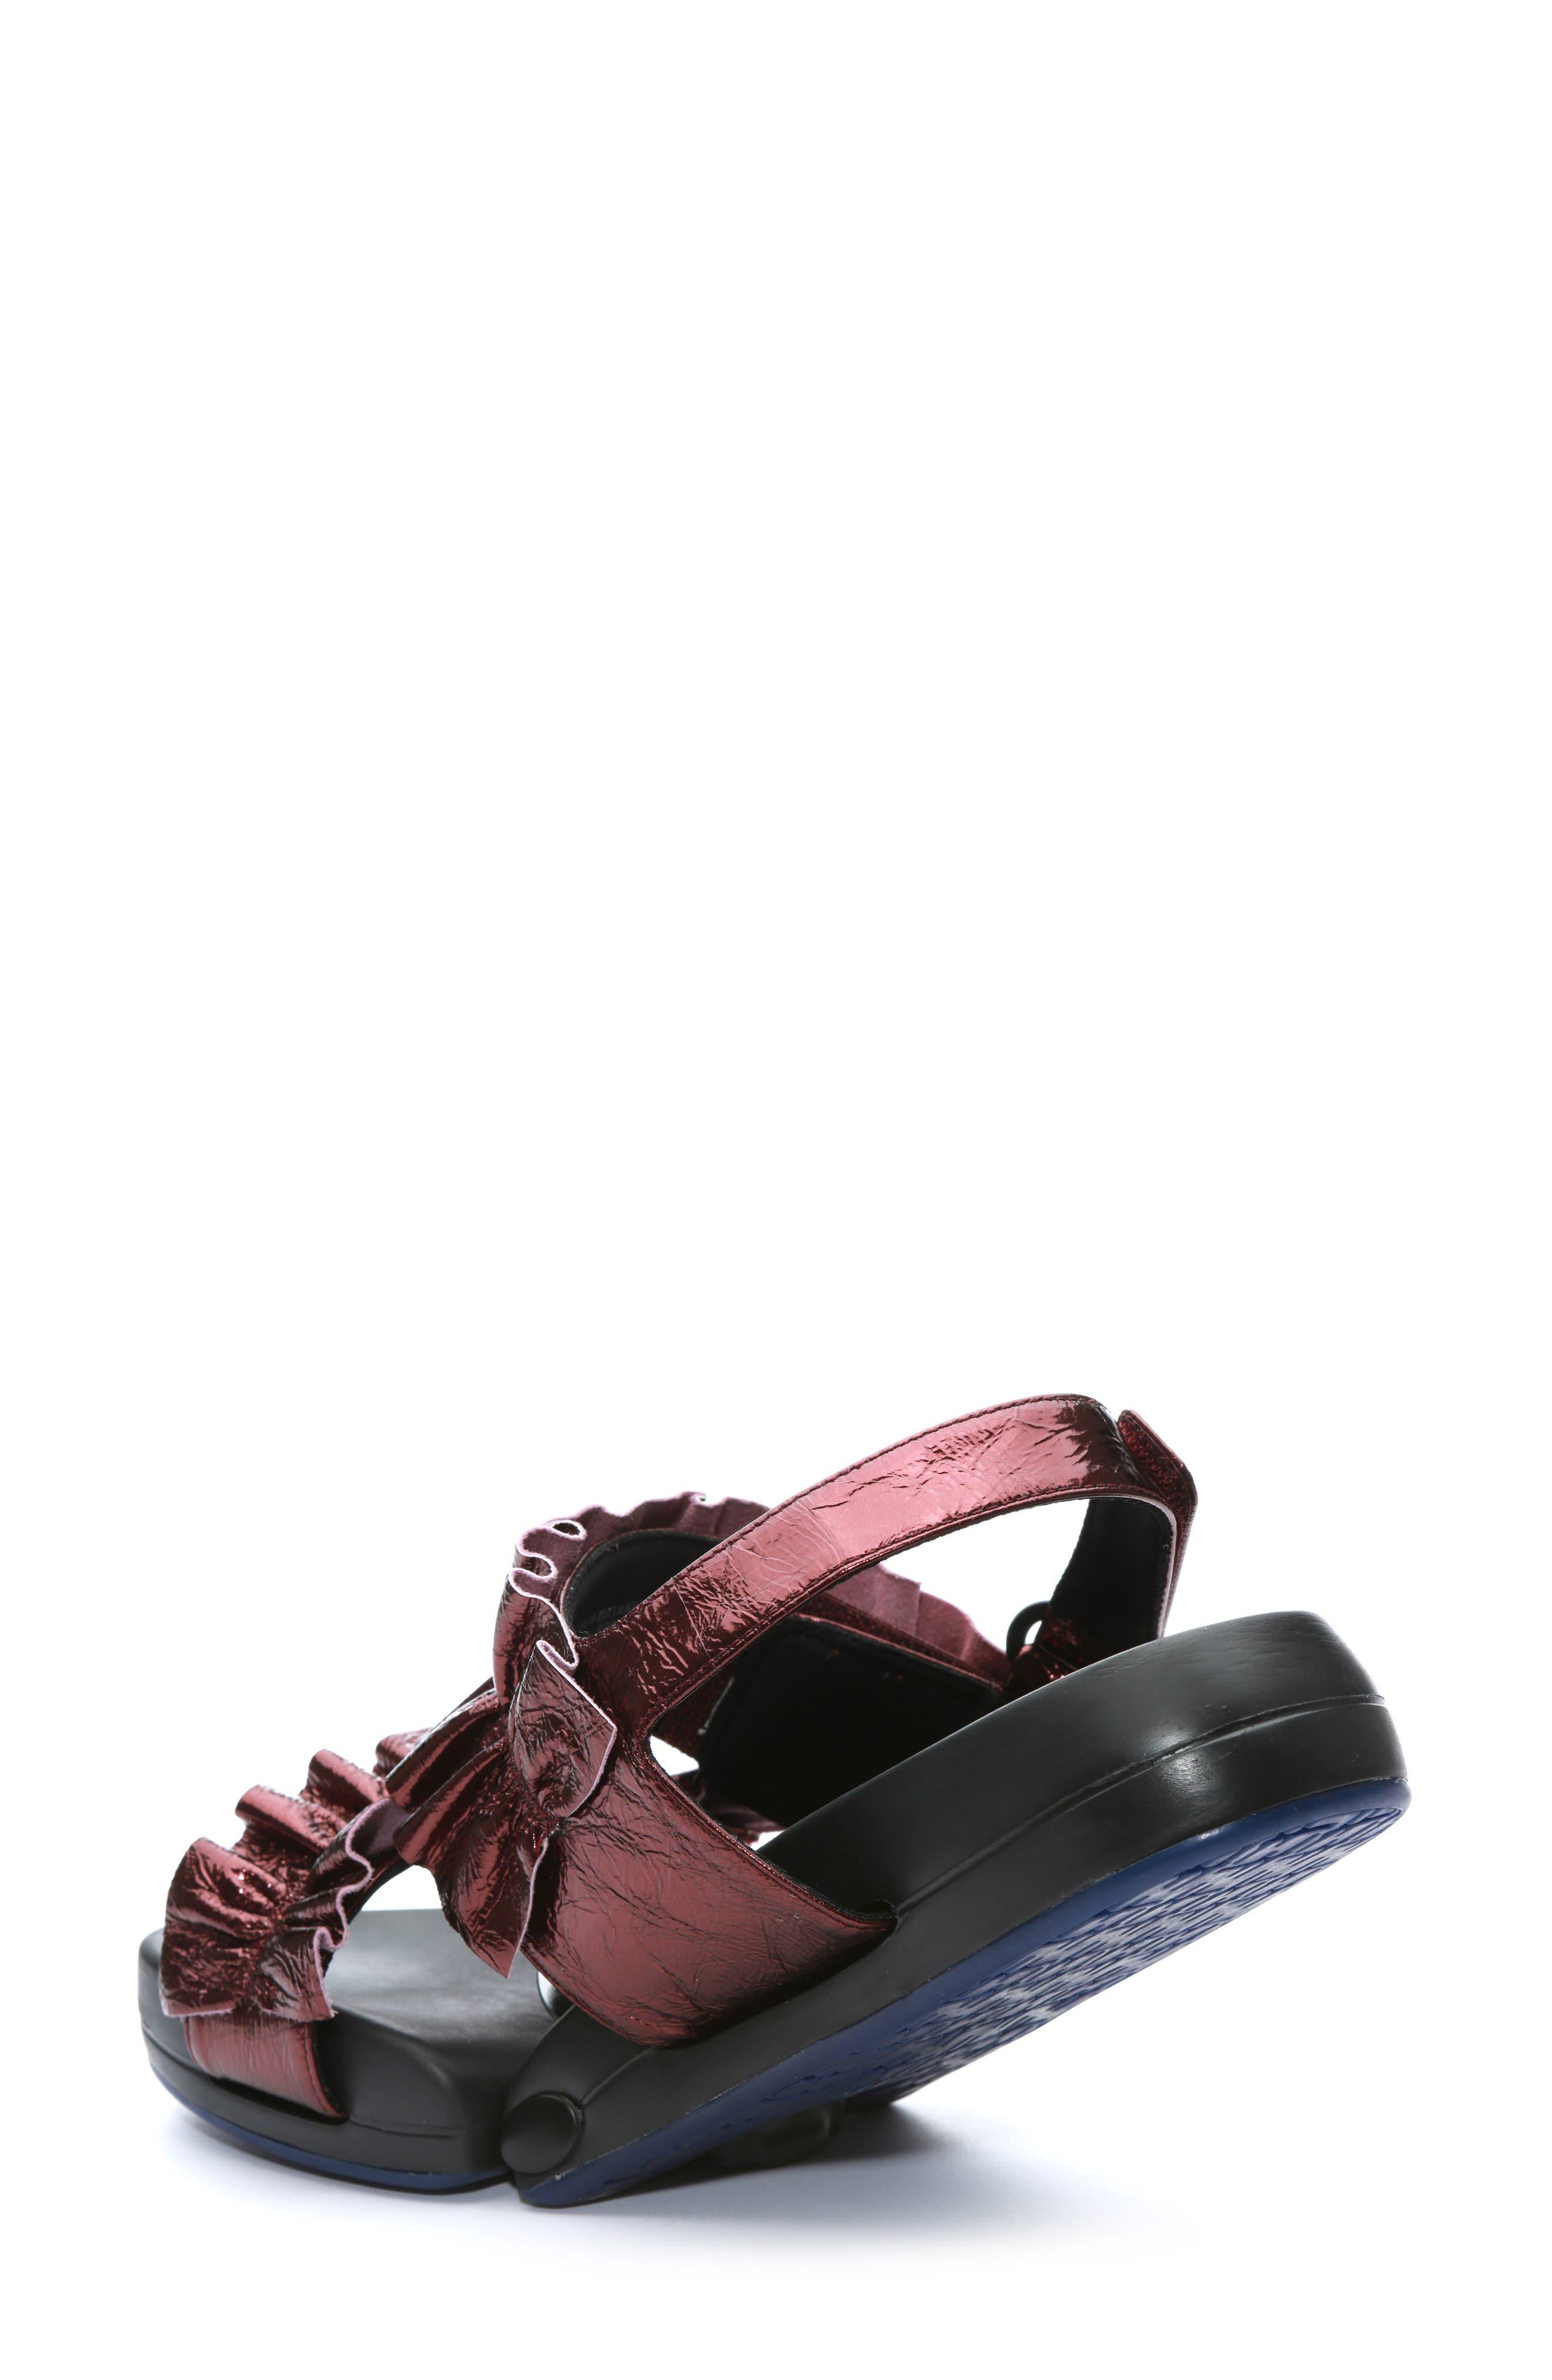 Figulous Ruffle Sandal,                             Alternate thumbnail 2, color,                             BORDEAUX METALLIC LEATHER